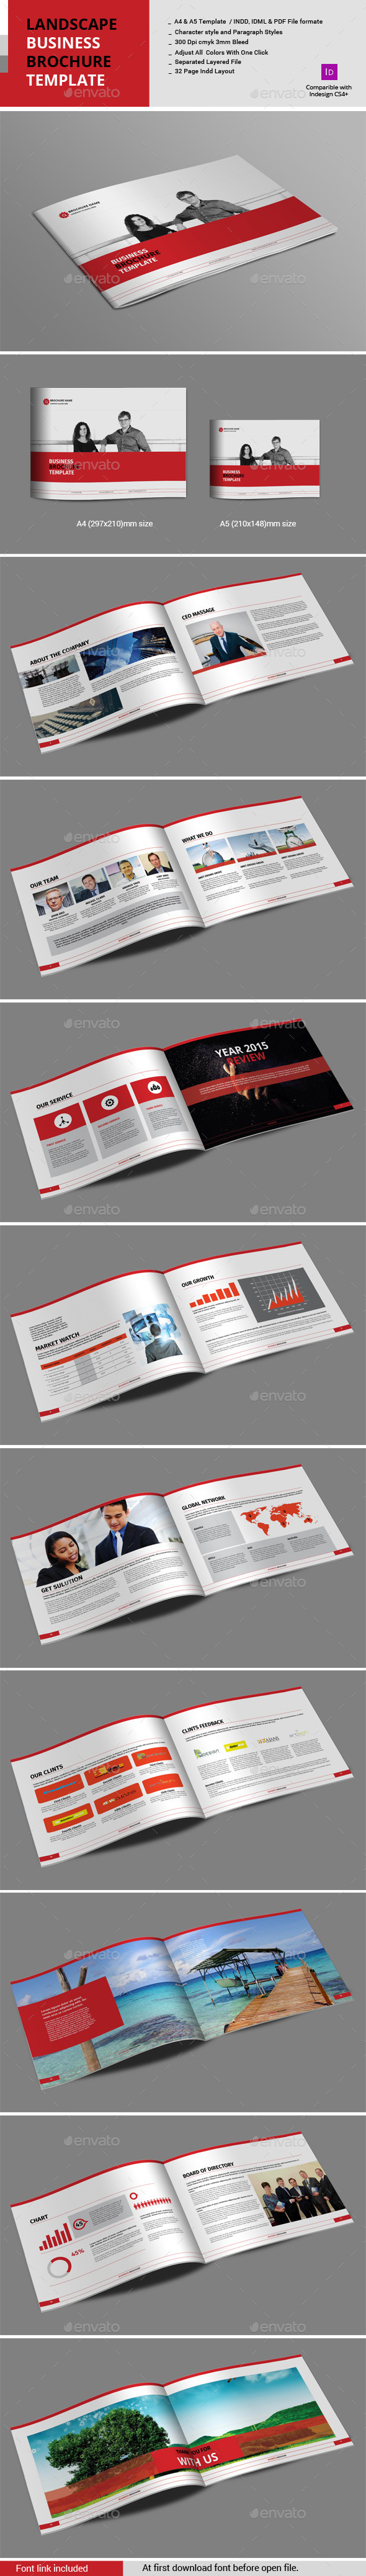 GraphicRiver Landscape Business Brochure Template 10929849